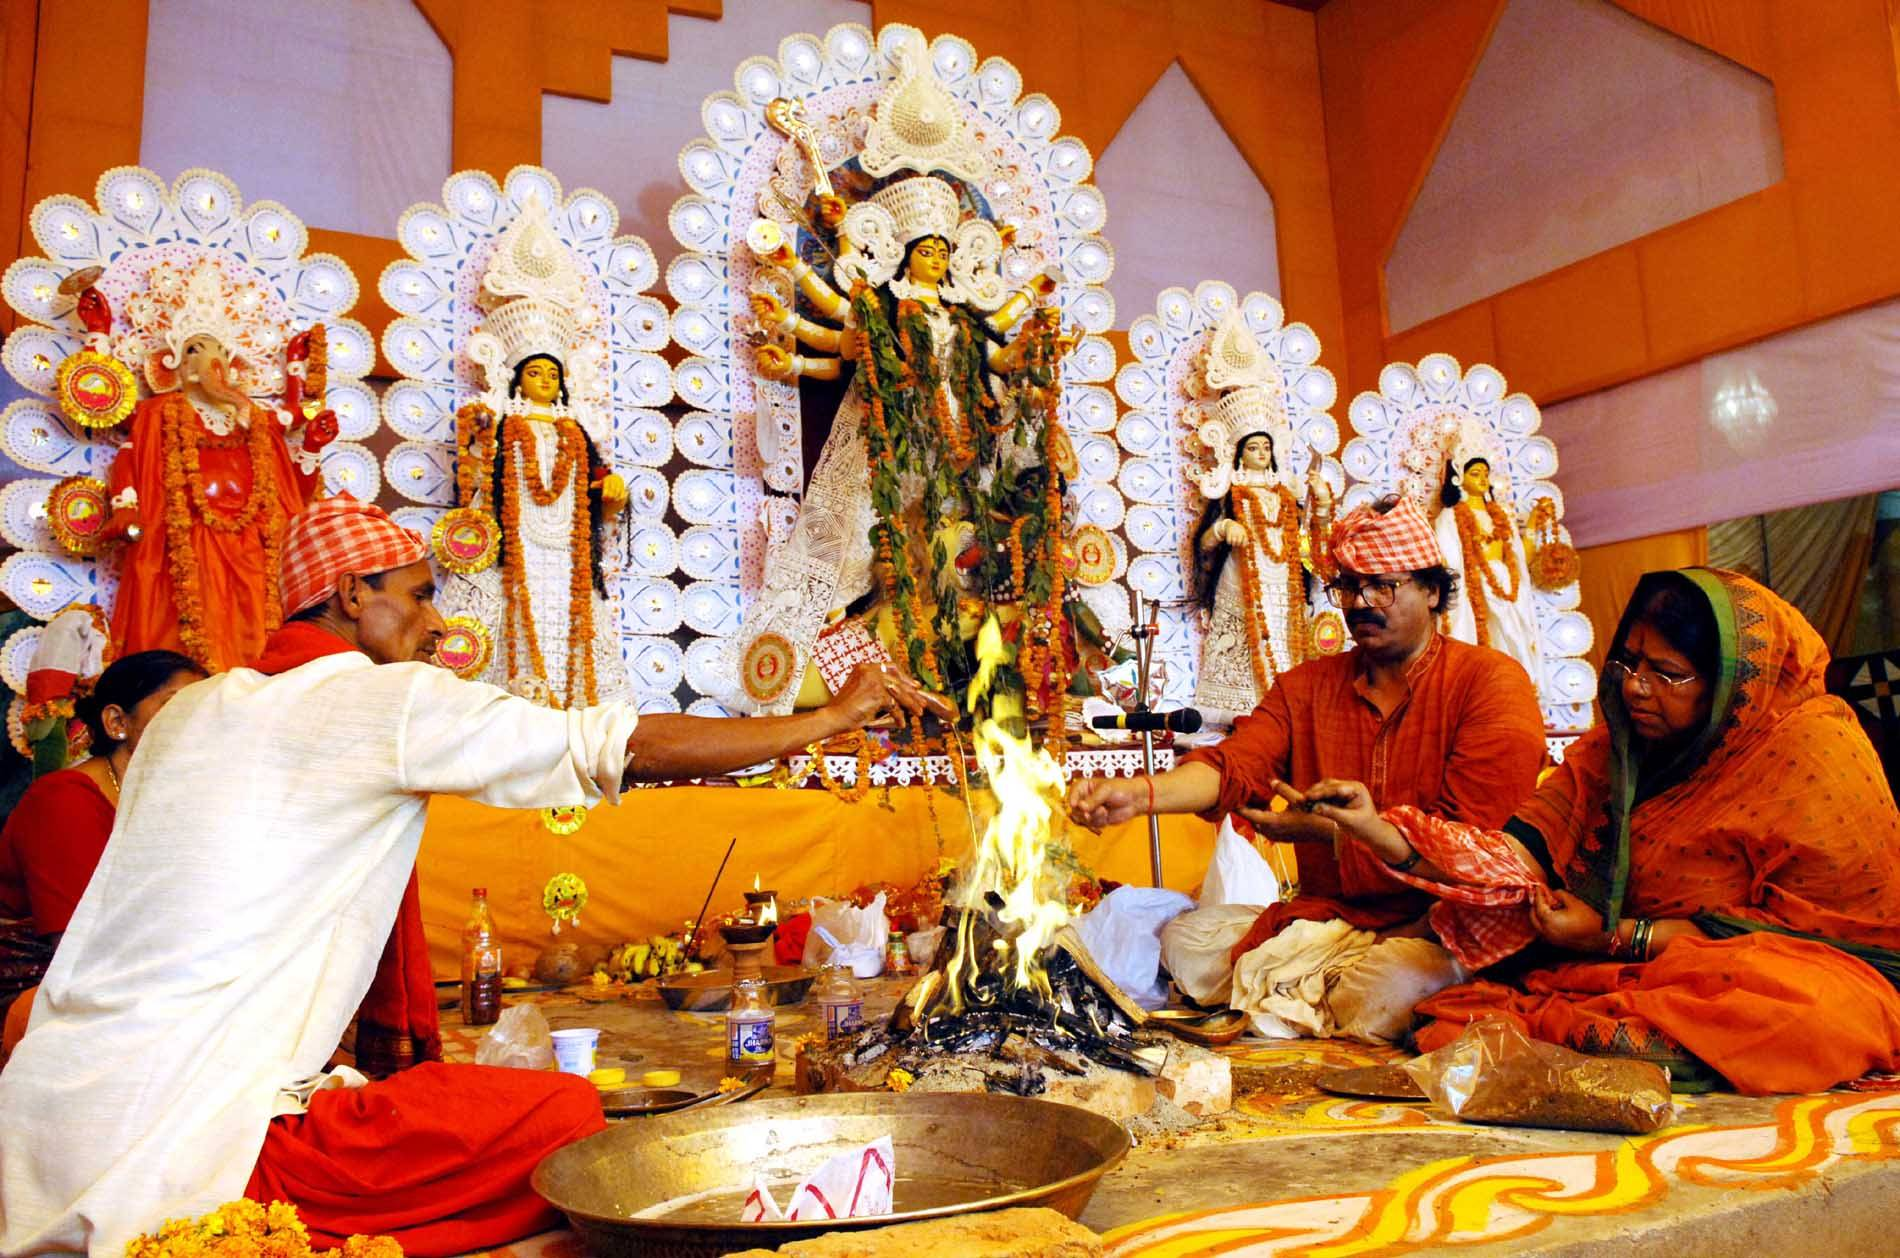 религиозные традиции картинки материал